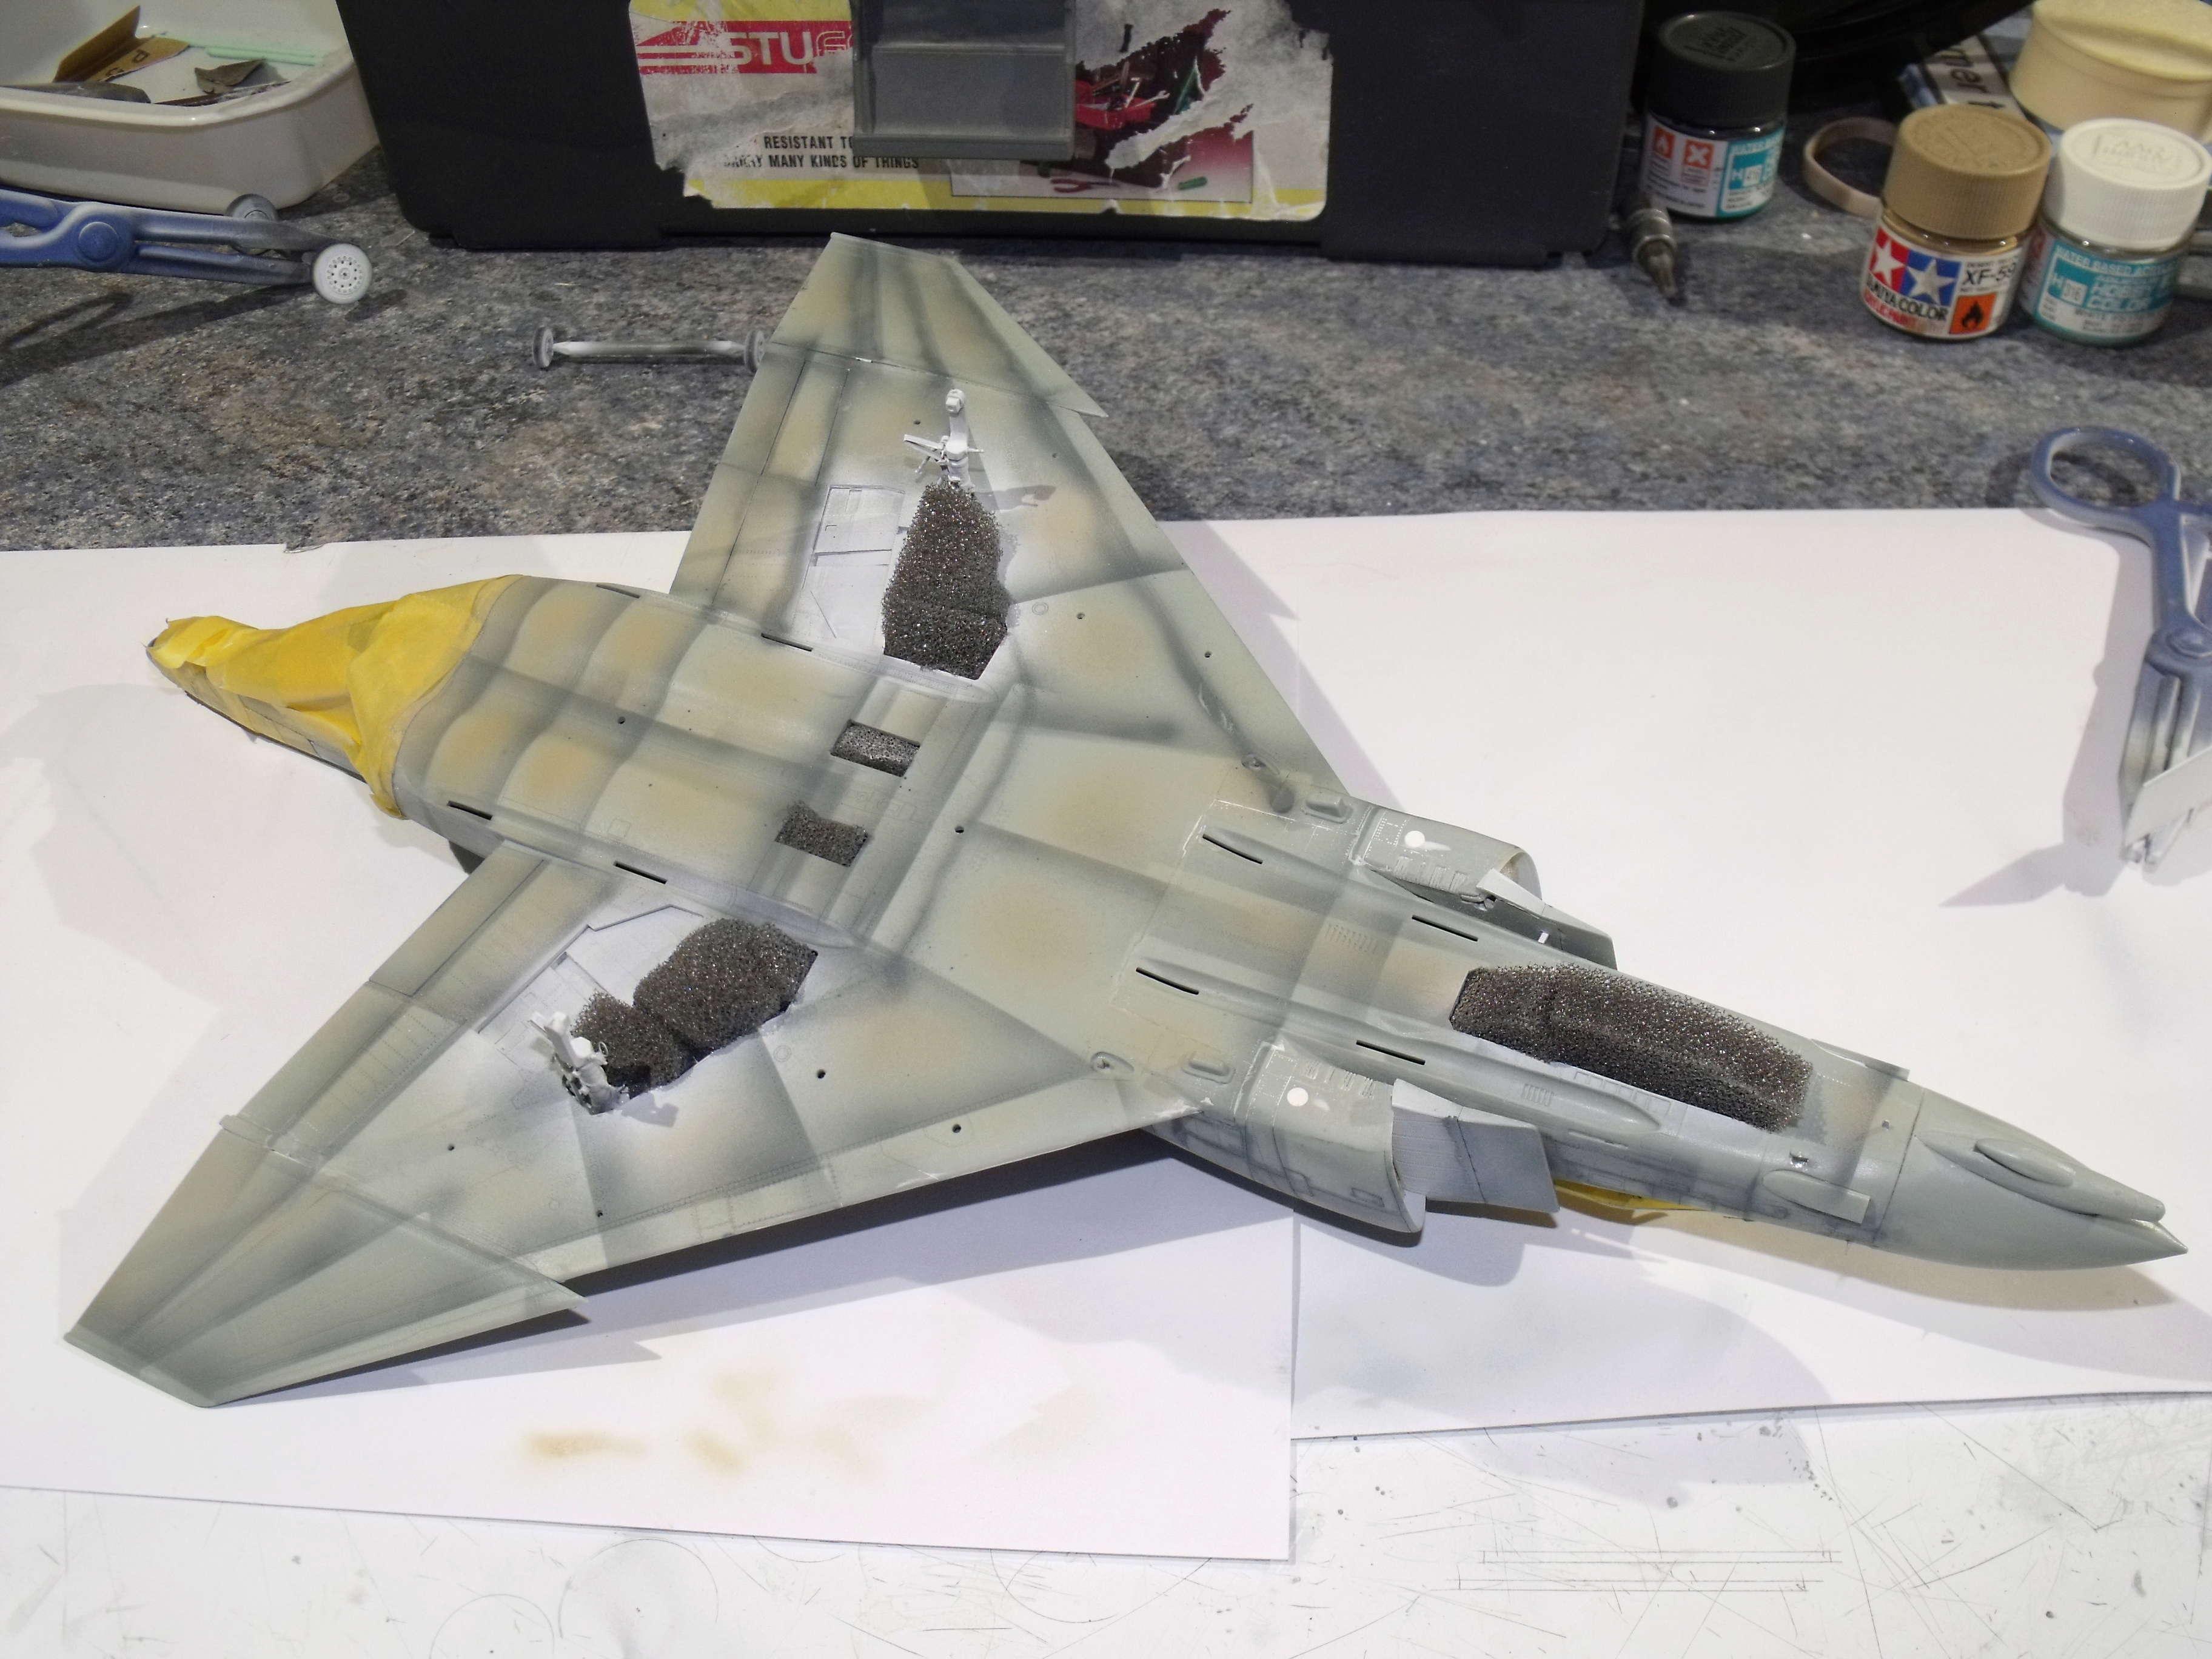 F-4 B Phantom 1/48° - VF-51 - 1972 - Début de patine. - Page 4 Dscf7038